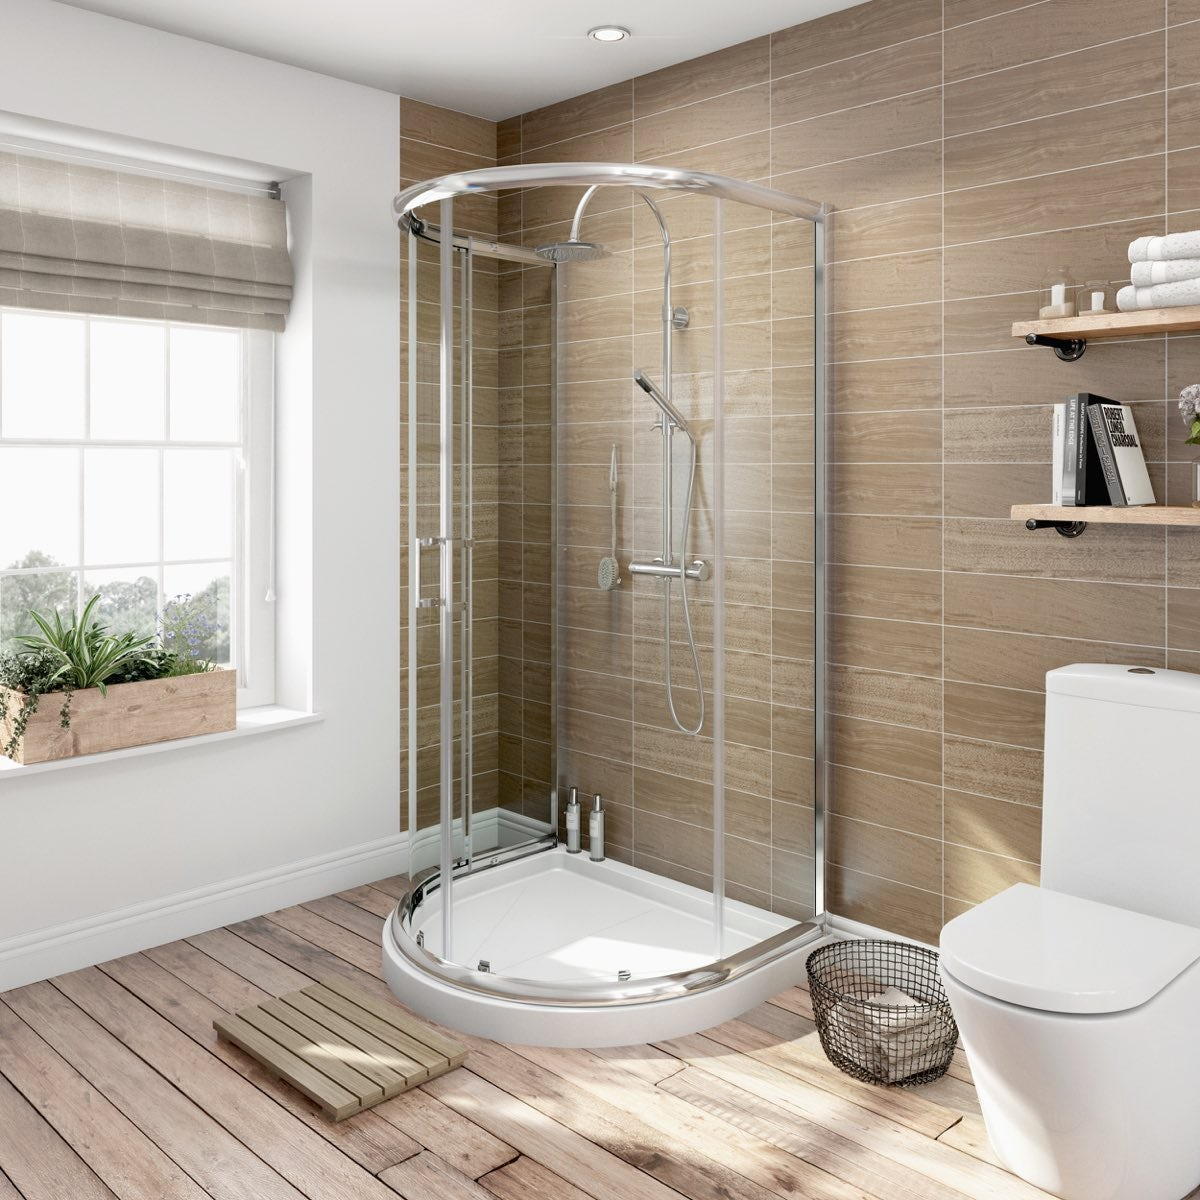 Orchard 6mm sliding D shaped shower enclosure 1030 x 900